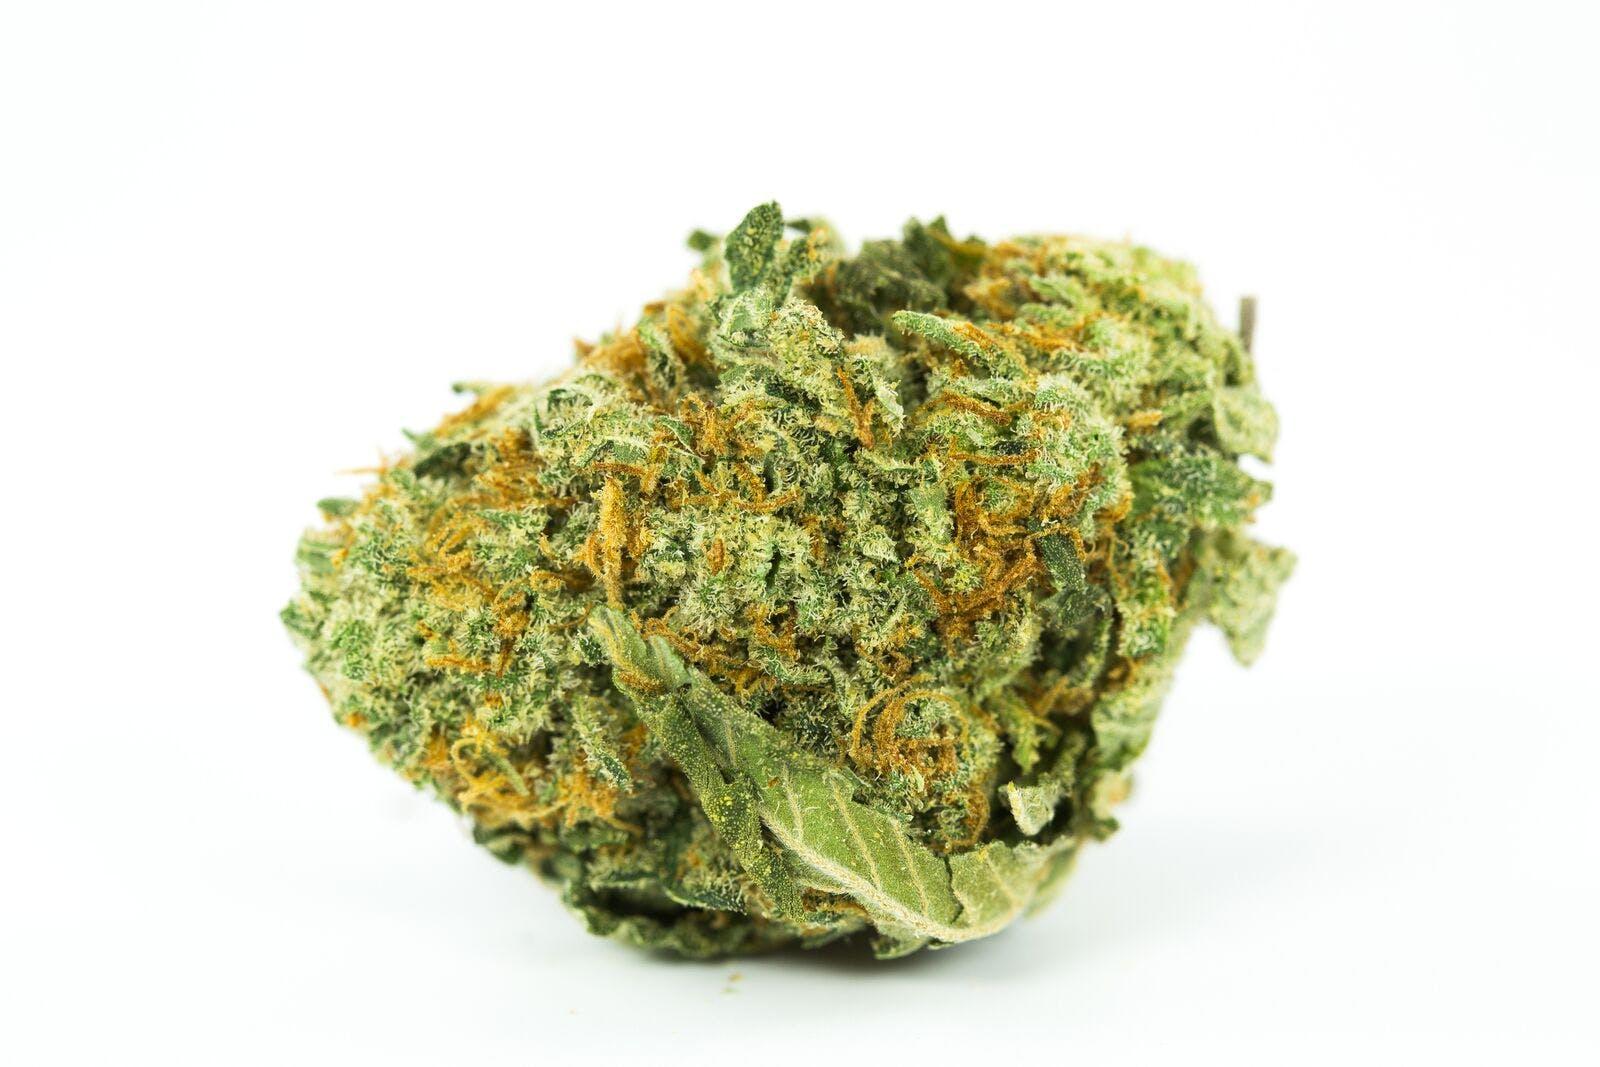 Blueberry Lemonade Weed; Blueberry Lemonade Cannabis Strain; Blueberry Lemonade Indica Marijuana Strain